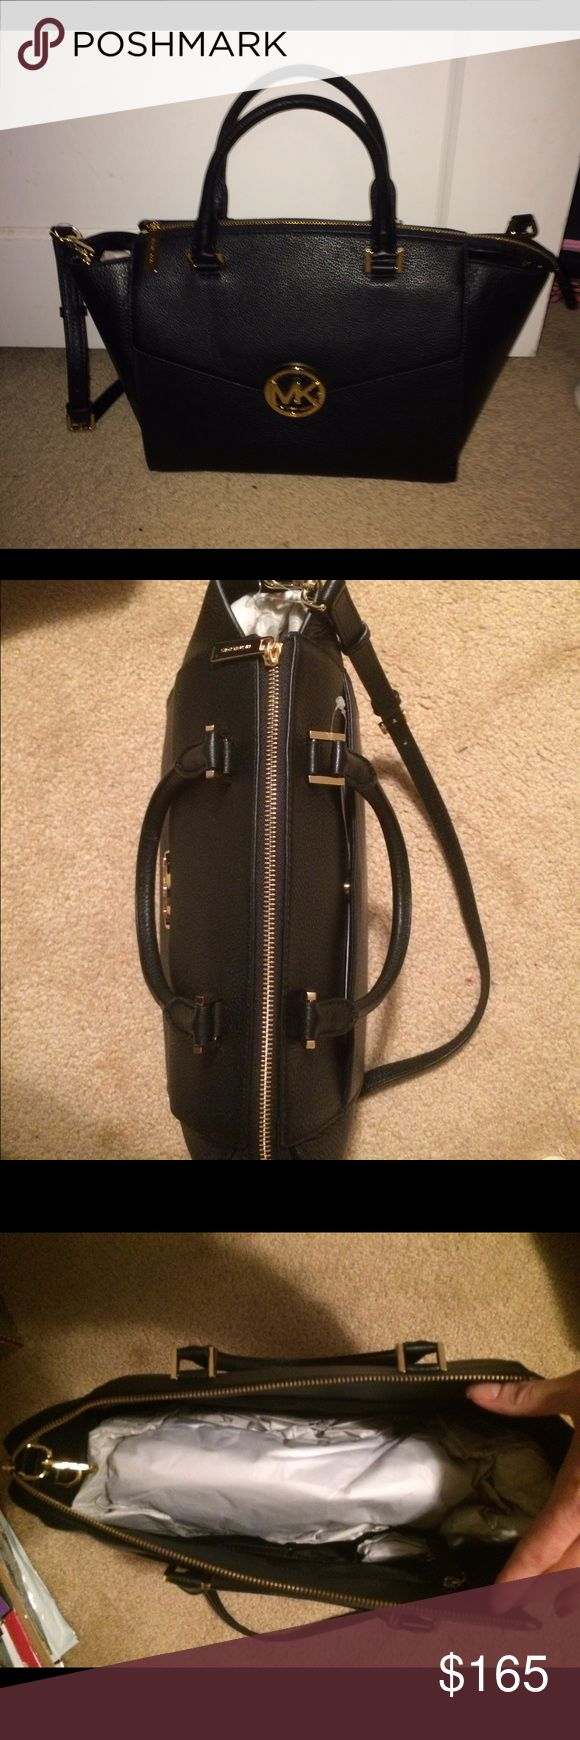 NWT Michael Kors Black Purse Brand new Michael Kors Hudson purse. KORS Michael Kors Bags Shoulder Bags